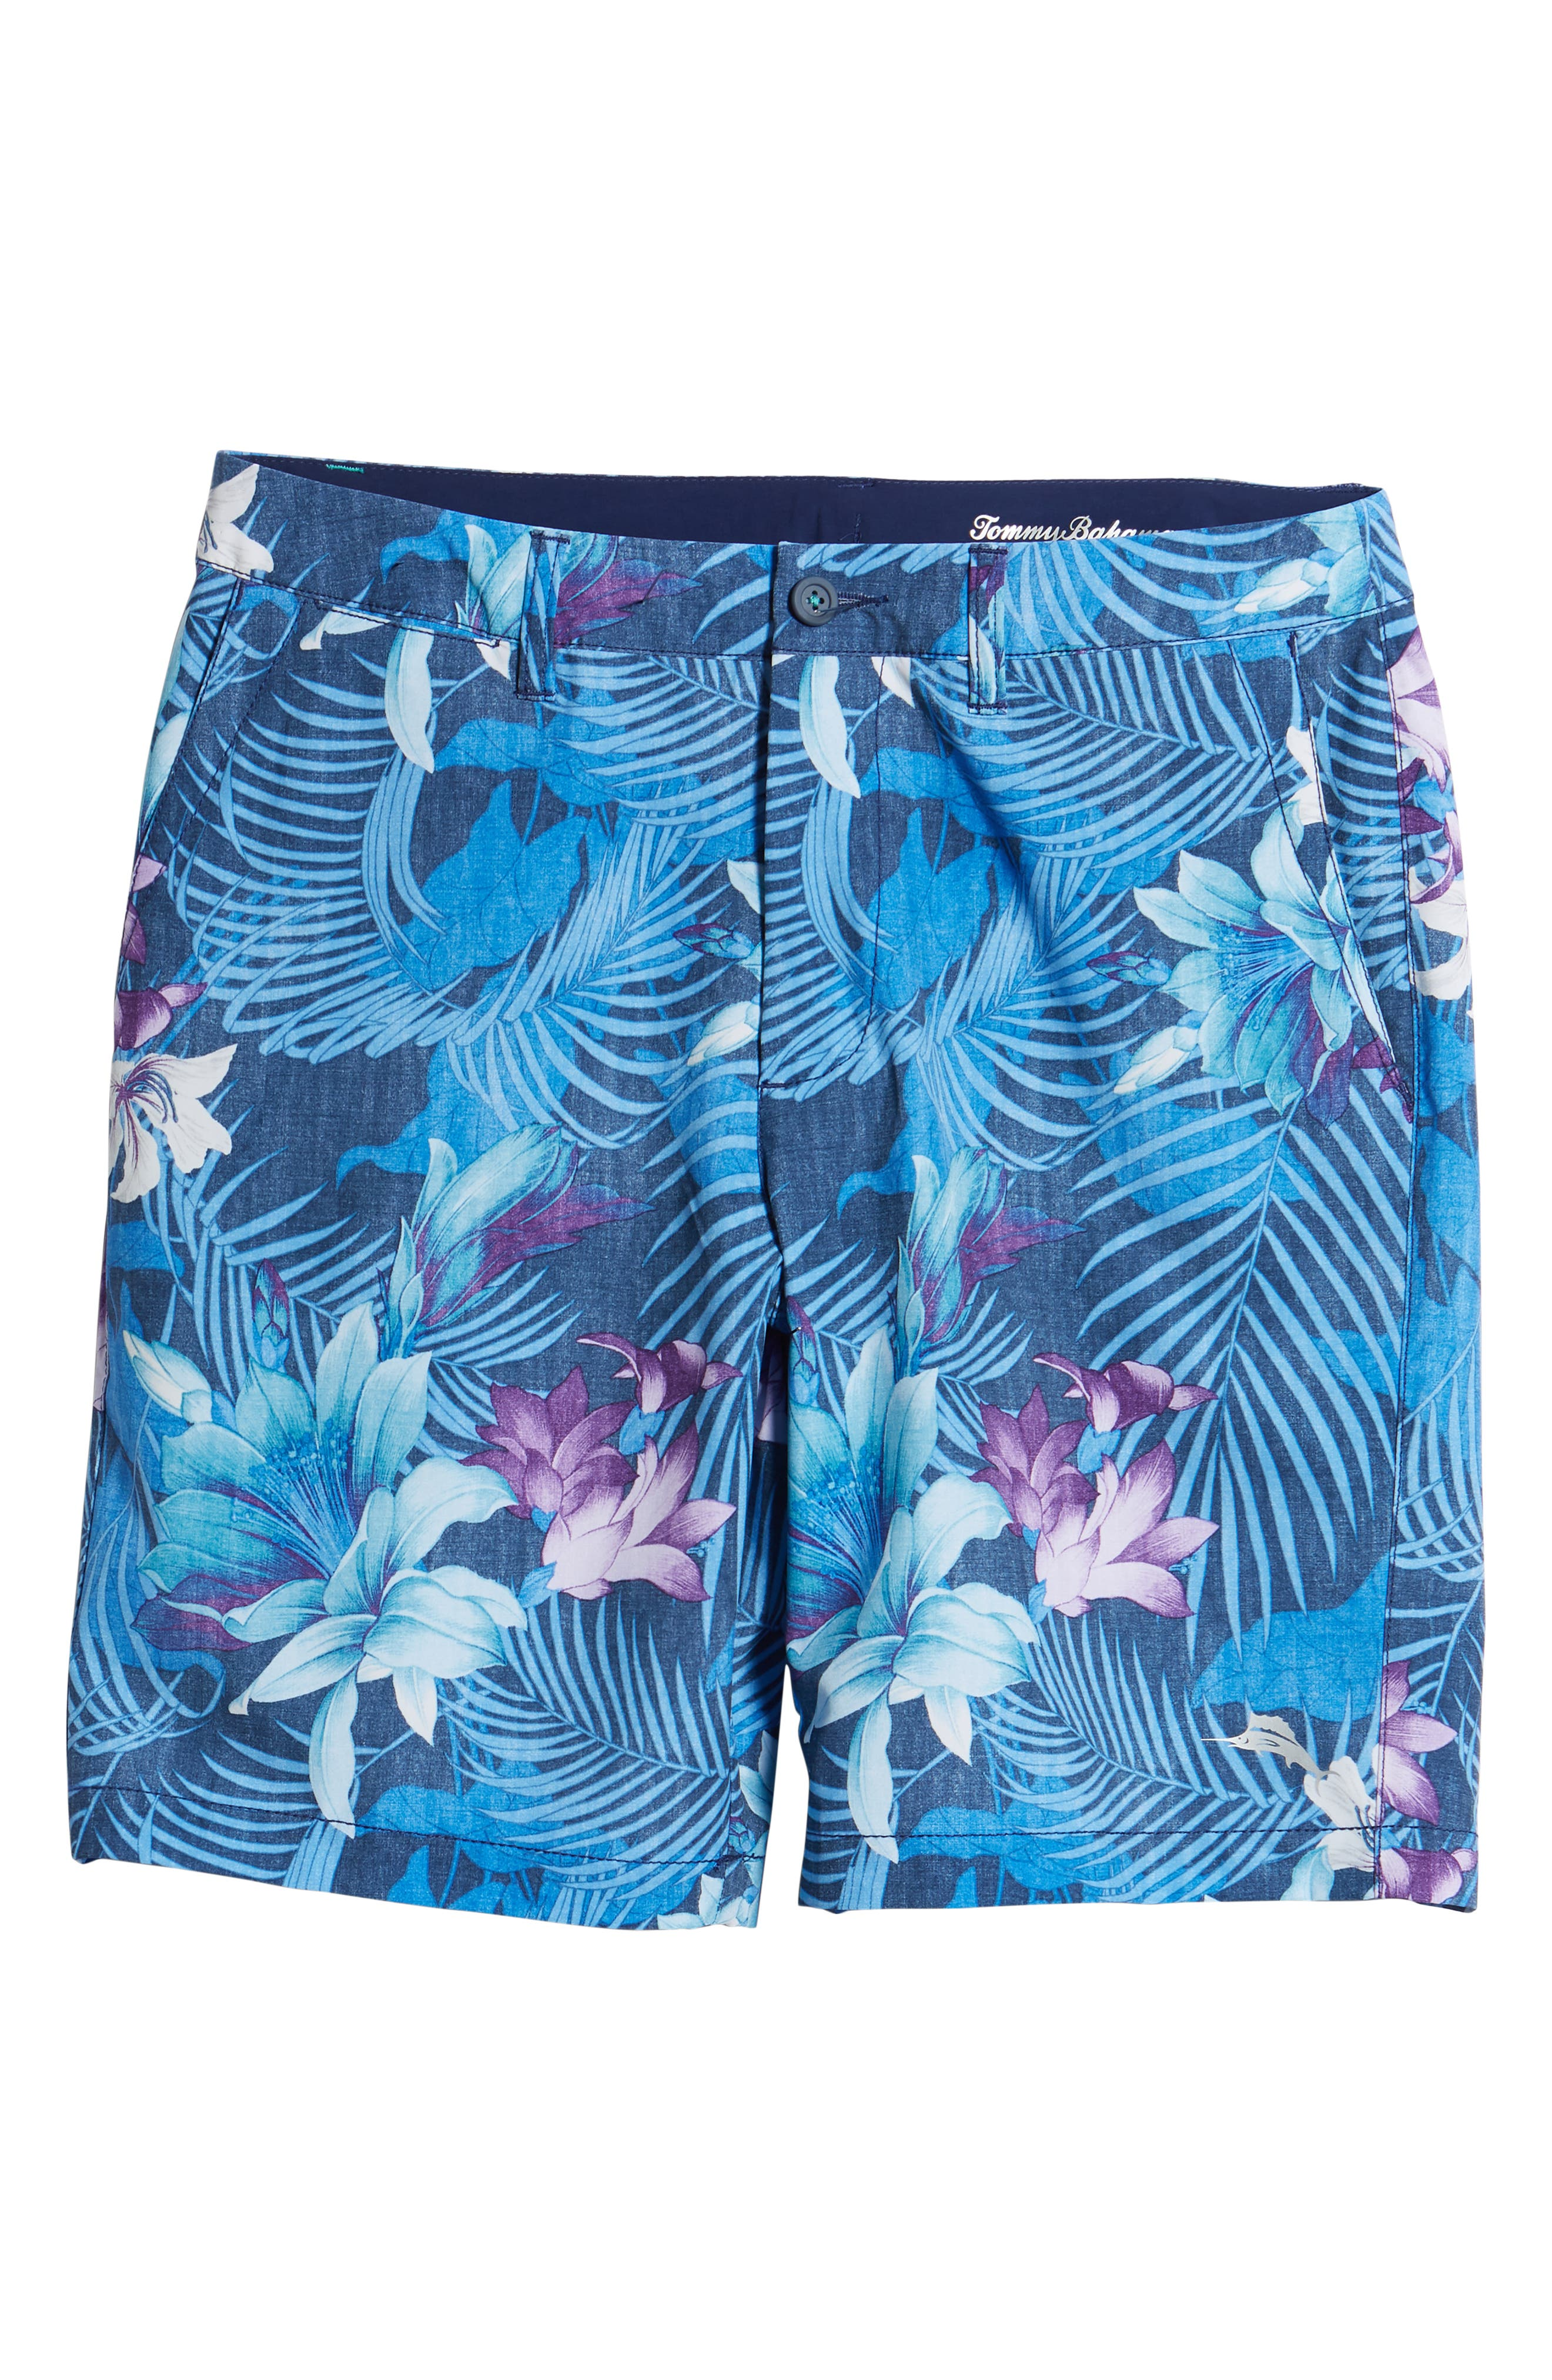 Cayman Laredo Blooms Board Shorts,                             Alternate thumbnail 6, color,                             400